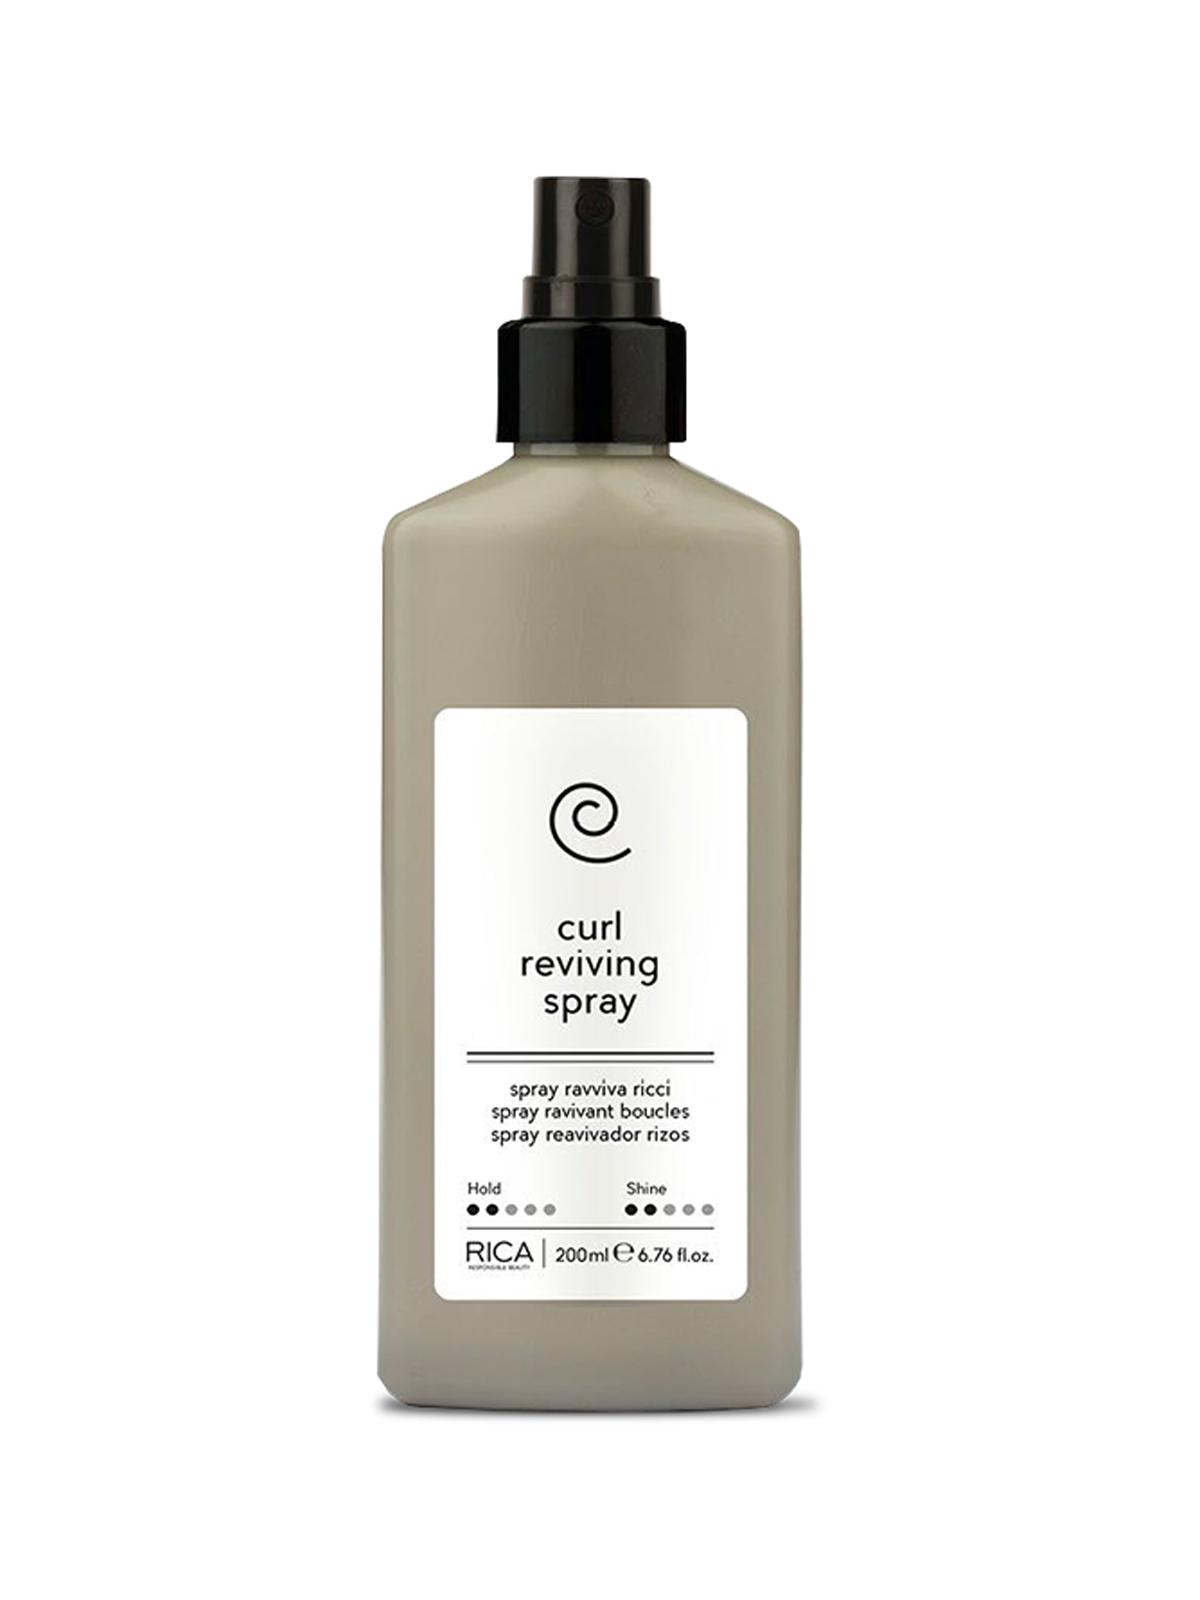 Rica Curl Reviving Spray